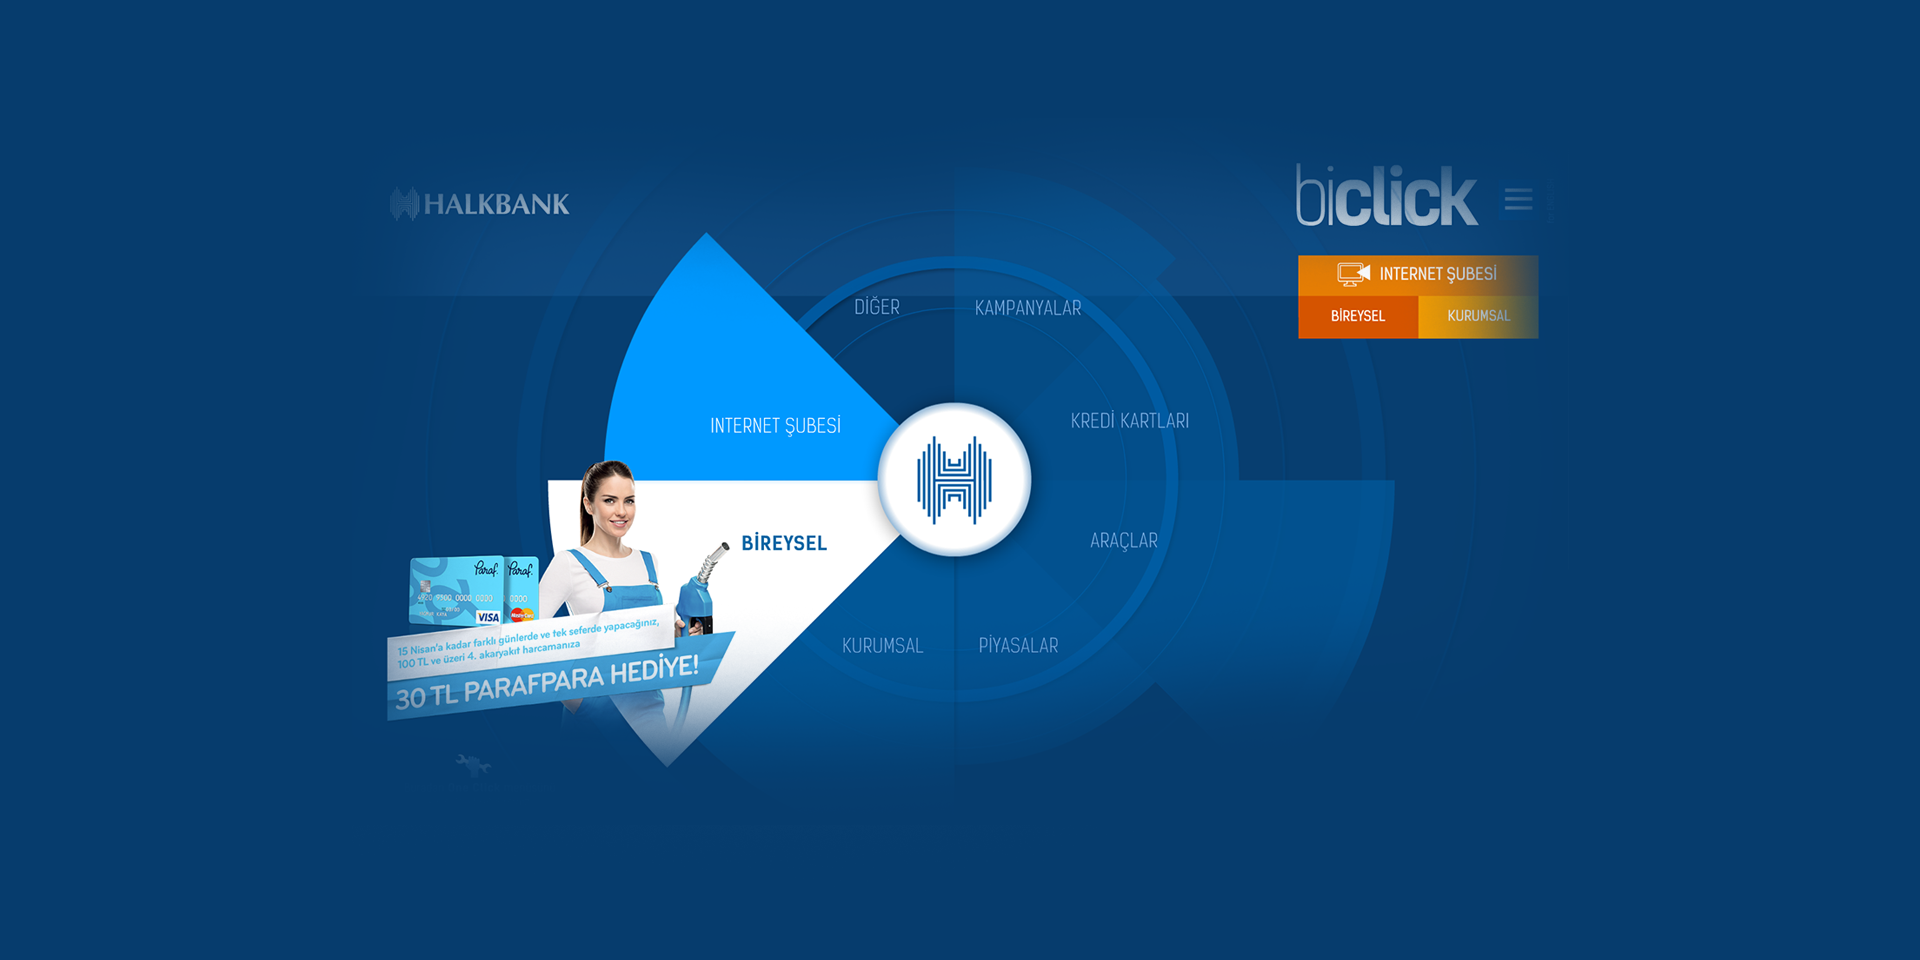 Halkbank biClick